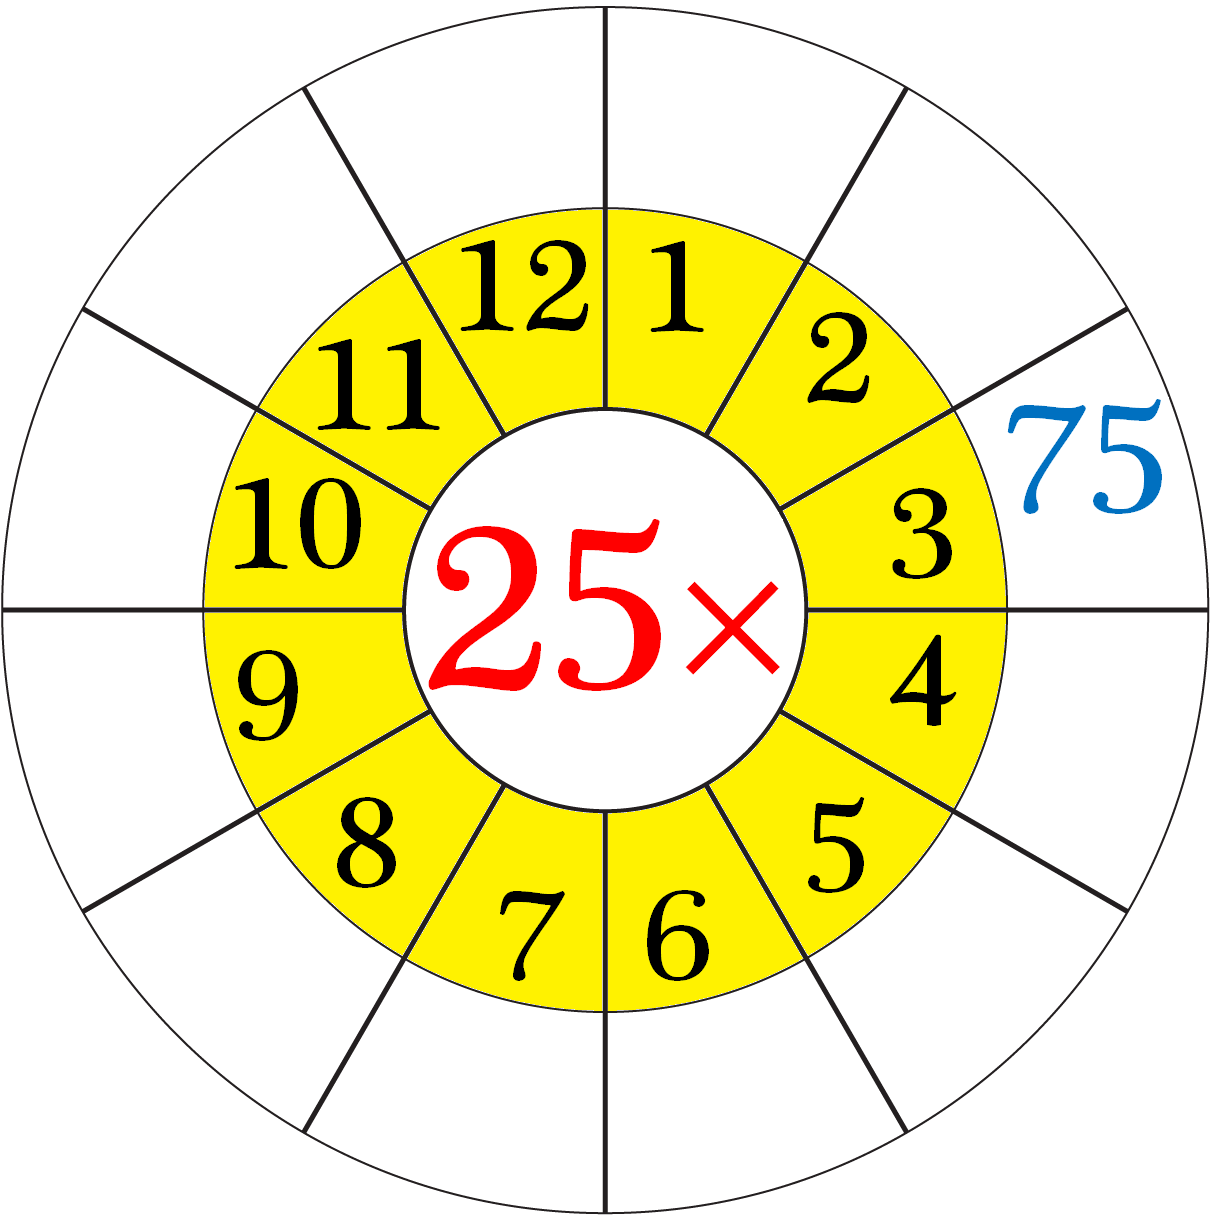 Worksheet on Multiplication Table of 25